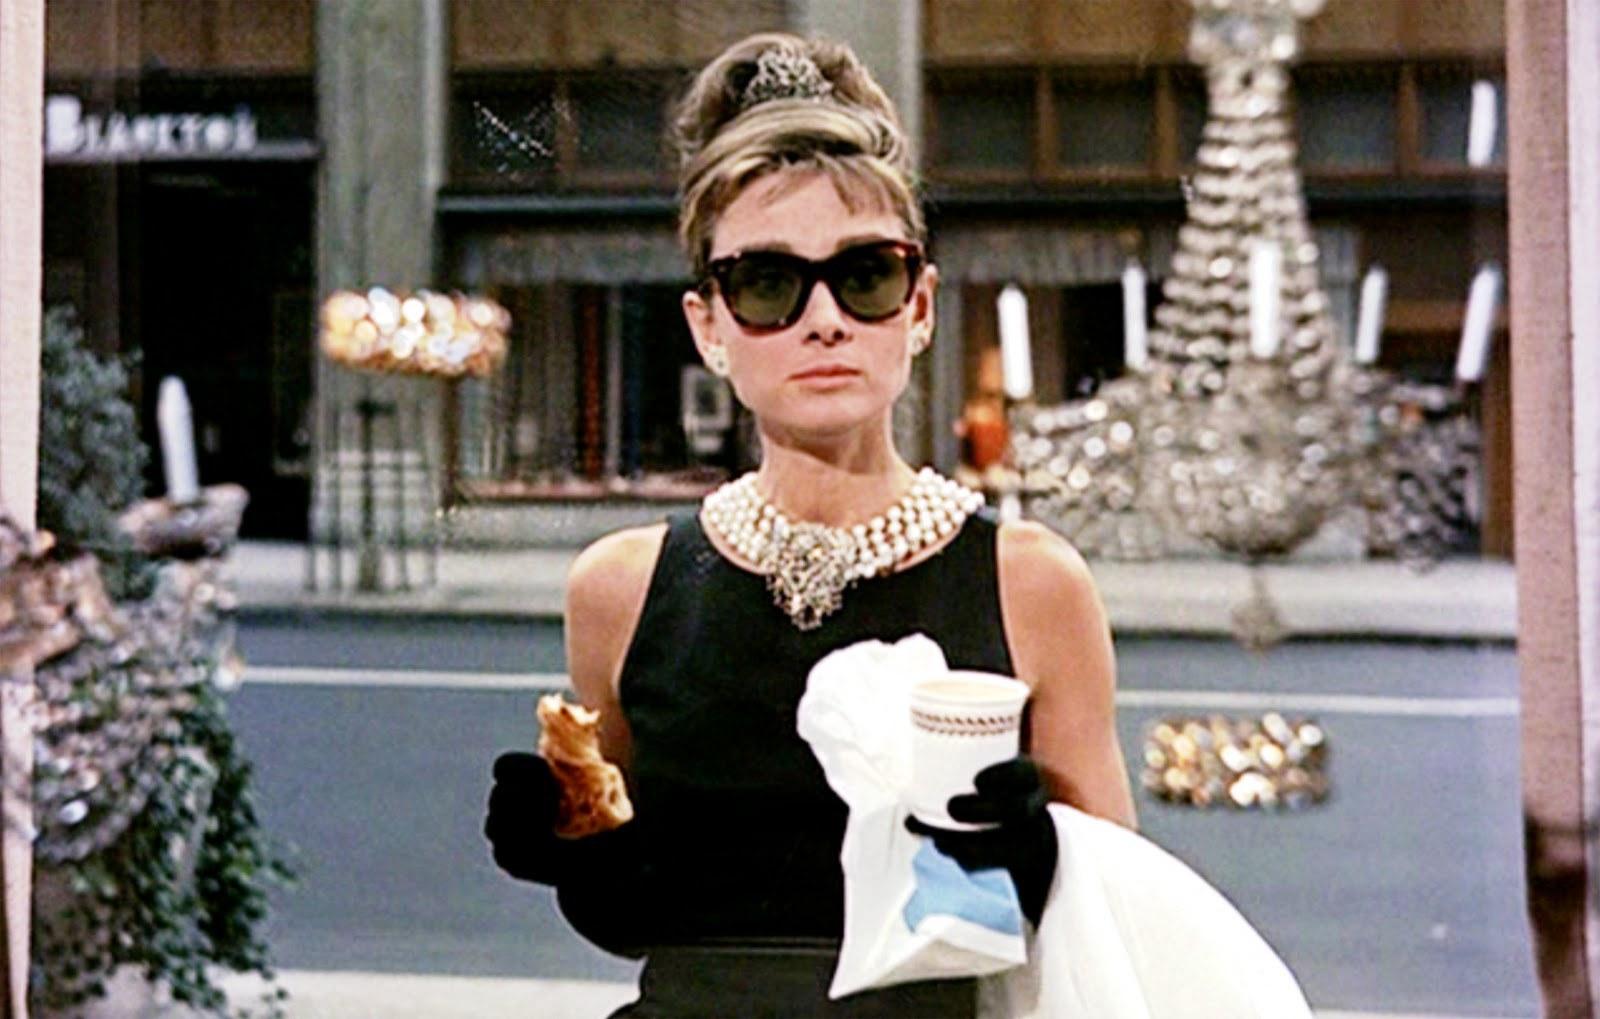 Tiffany & Co открыли кафе с завтраками за 29 долларов-320x180